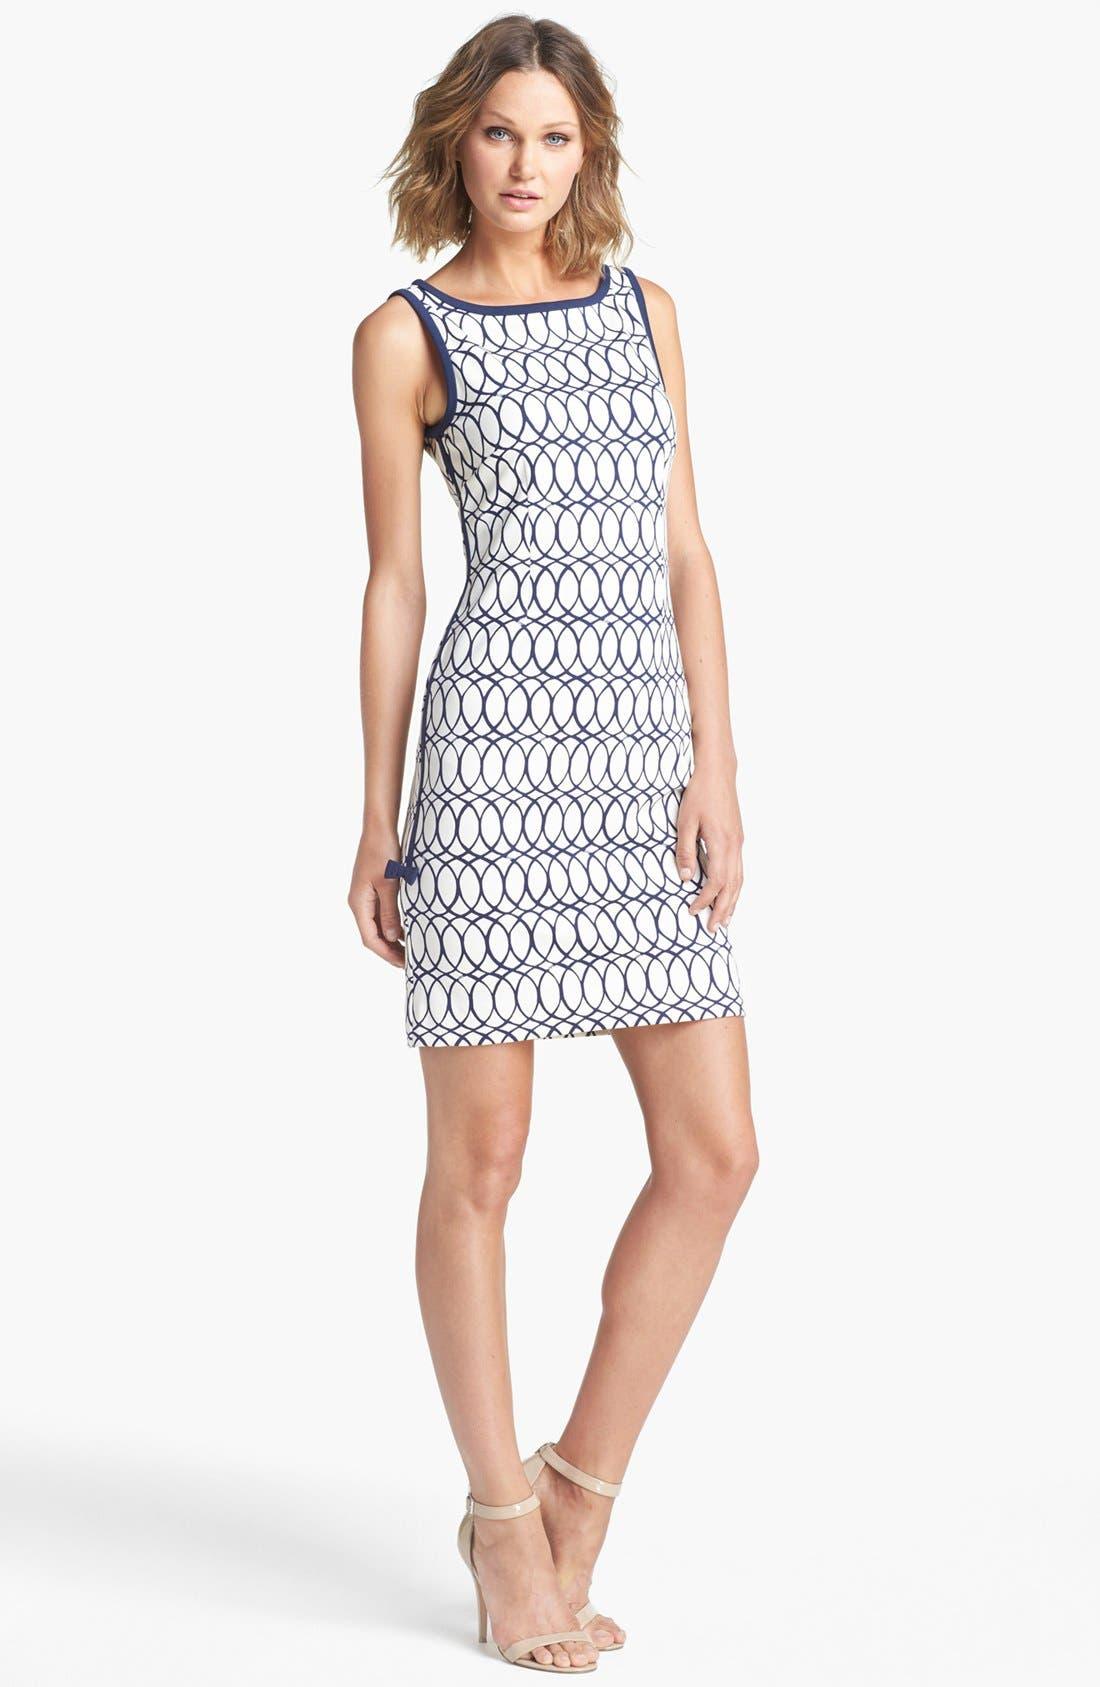 Main Image - Lilly Pulitzer® 'Francesca' Print Sheath Dress